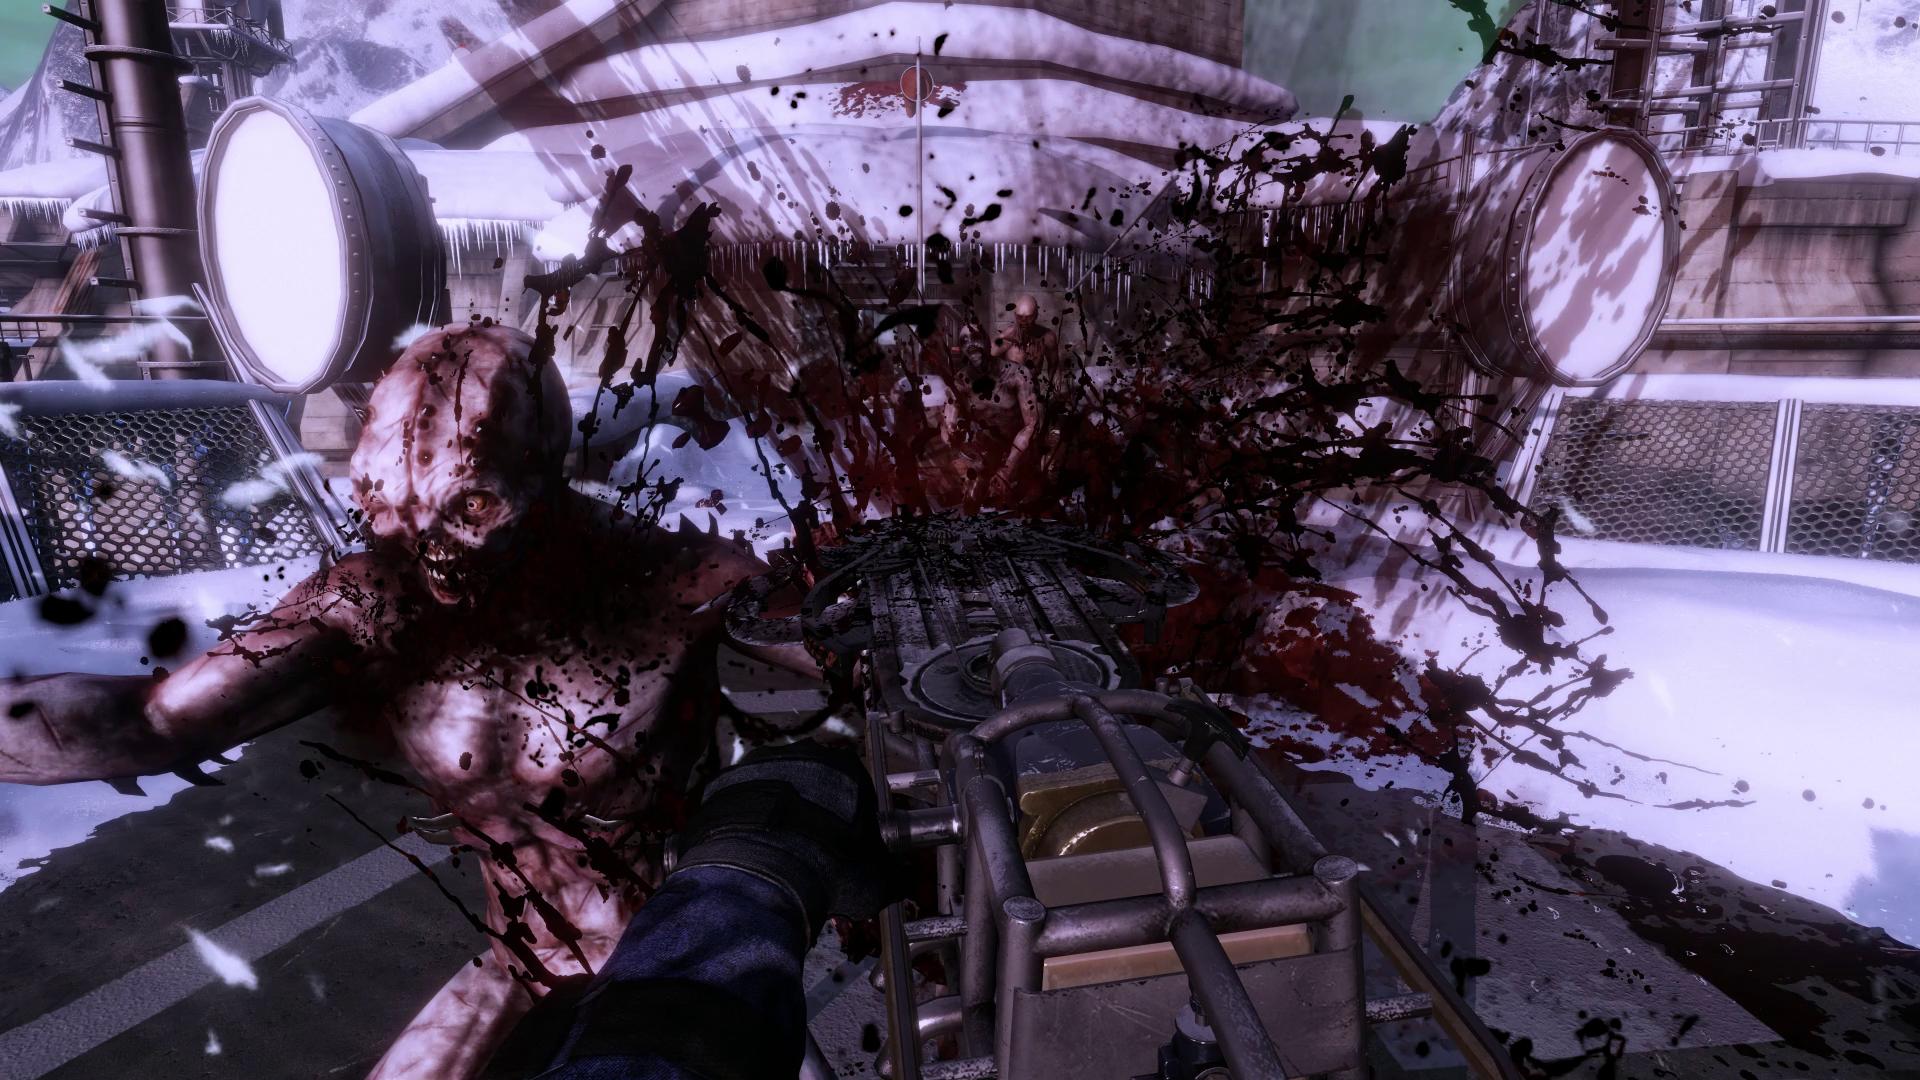 Čerstvá várka krvavých screenshotů z Killing Floor 2 105157